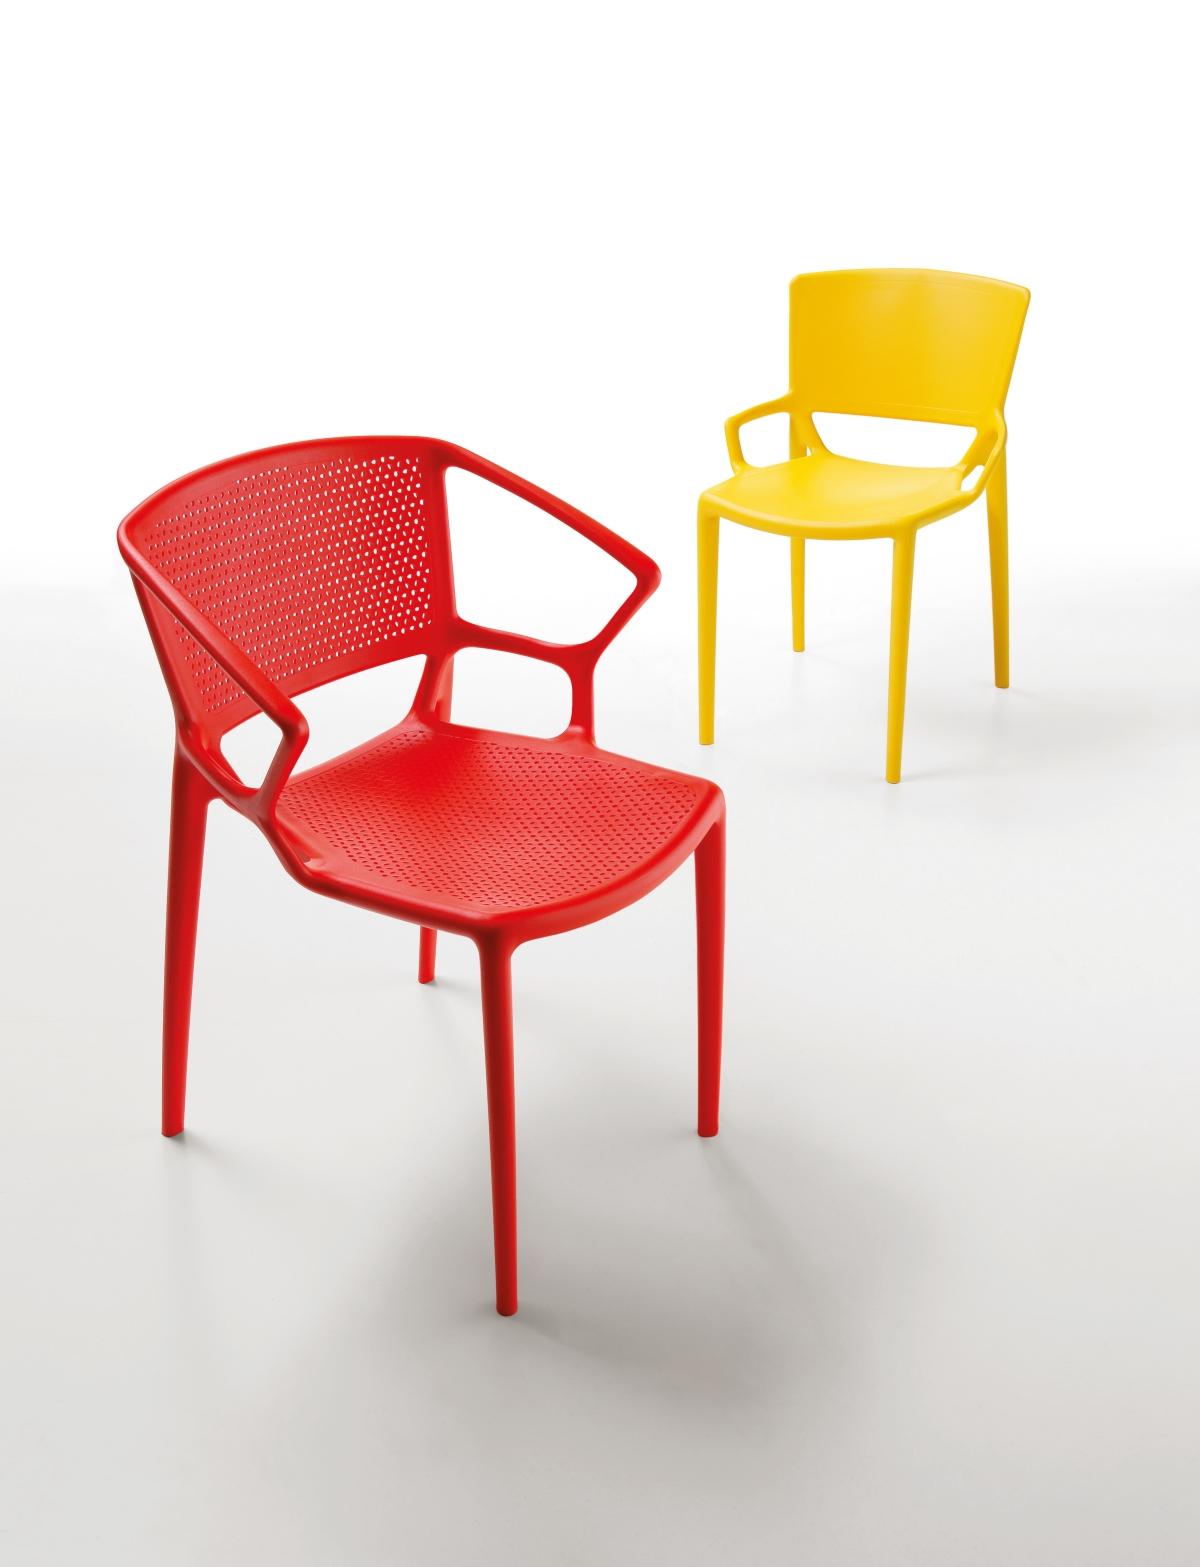 Infiniti Design chair Fiorellina